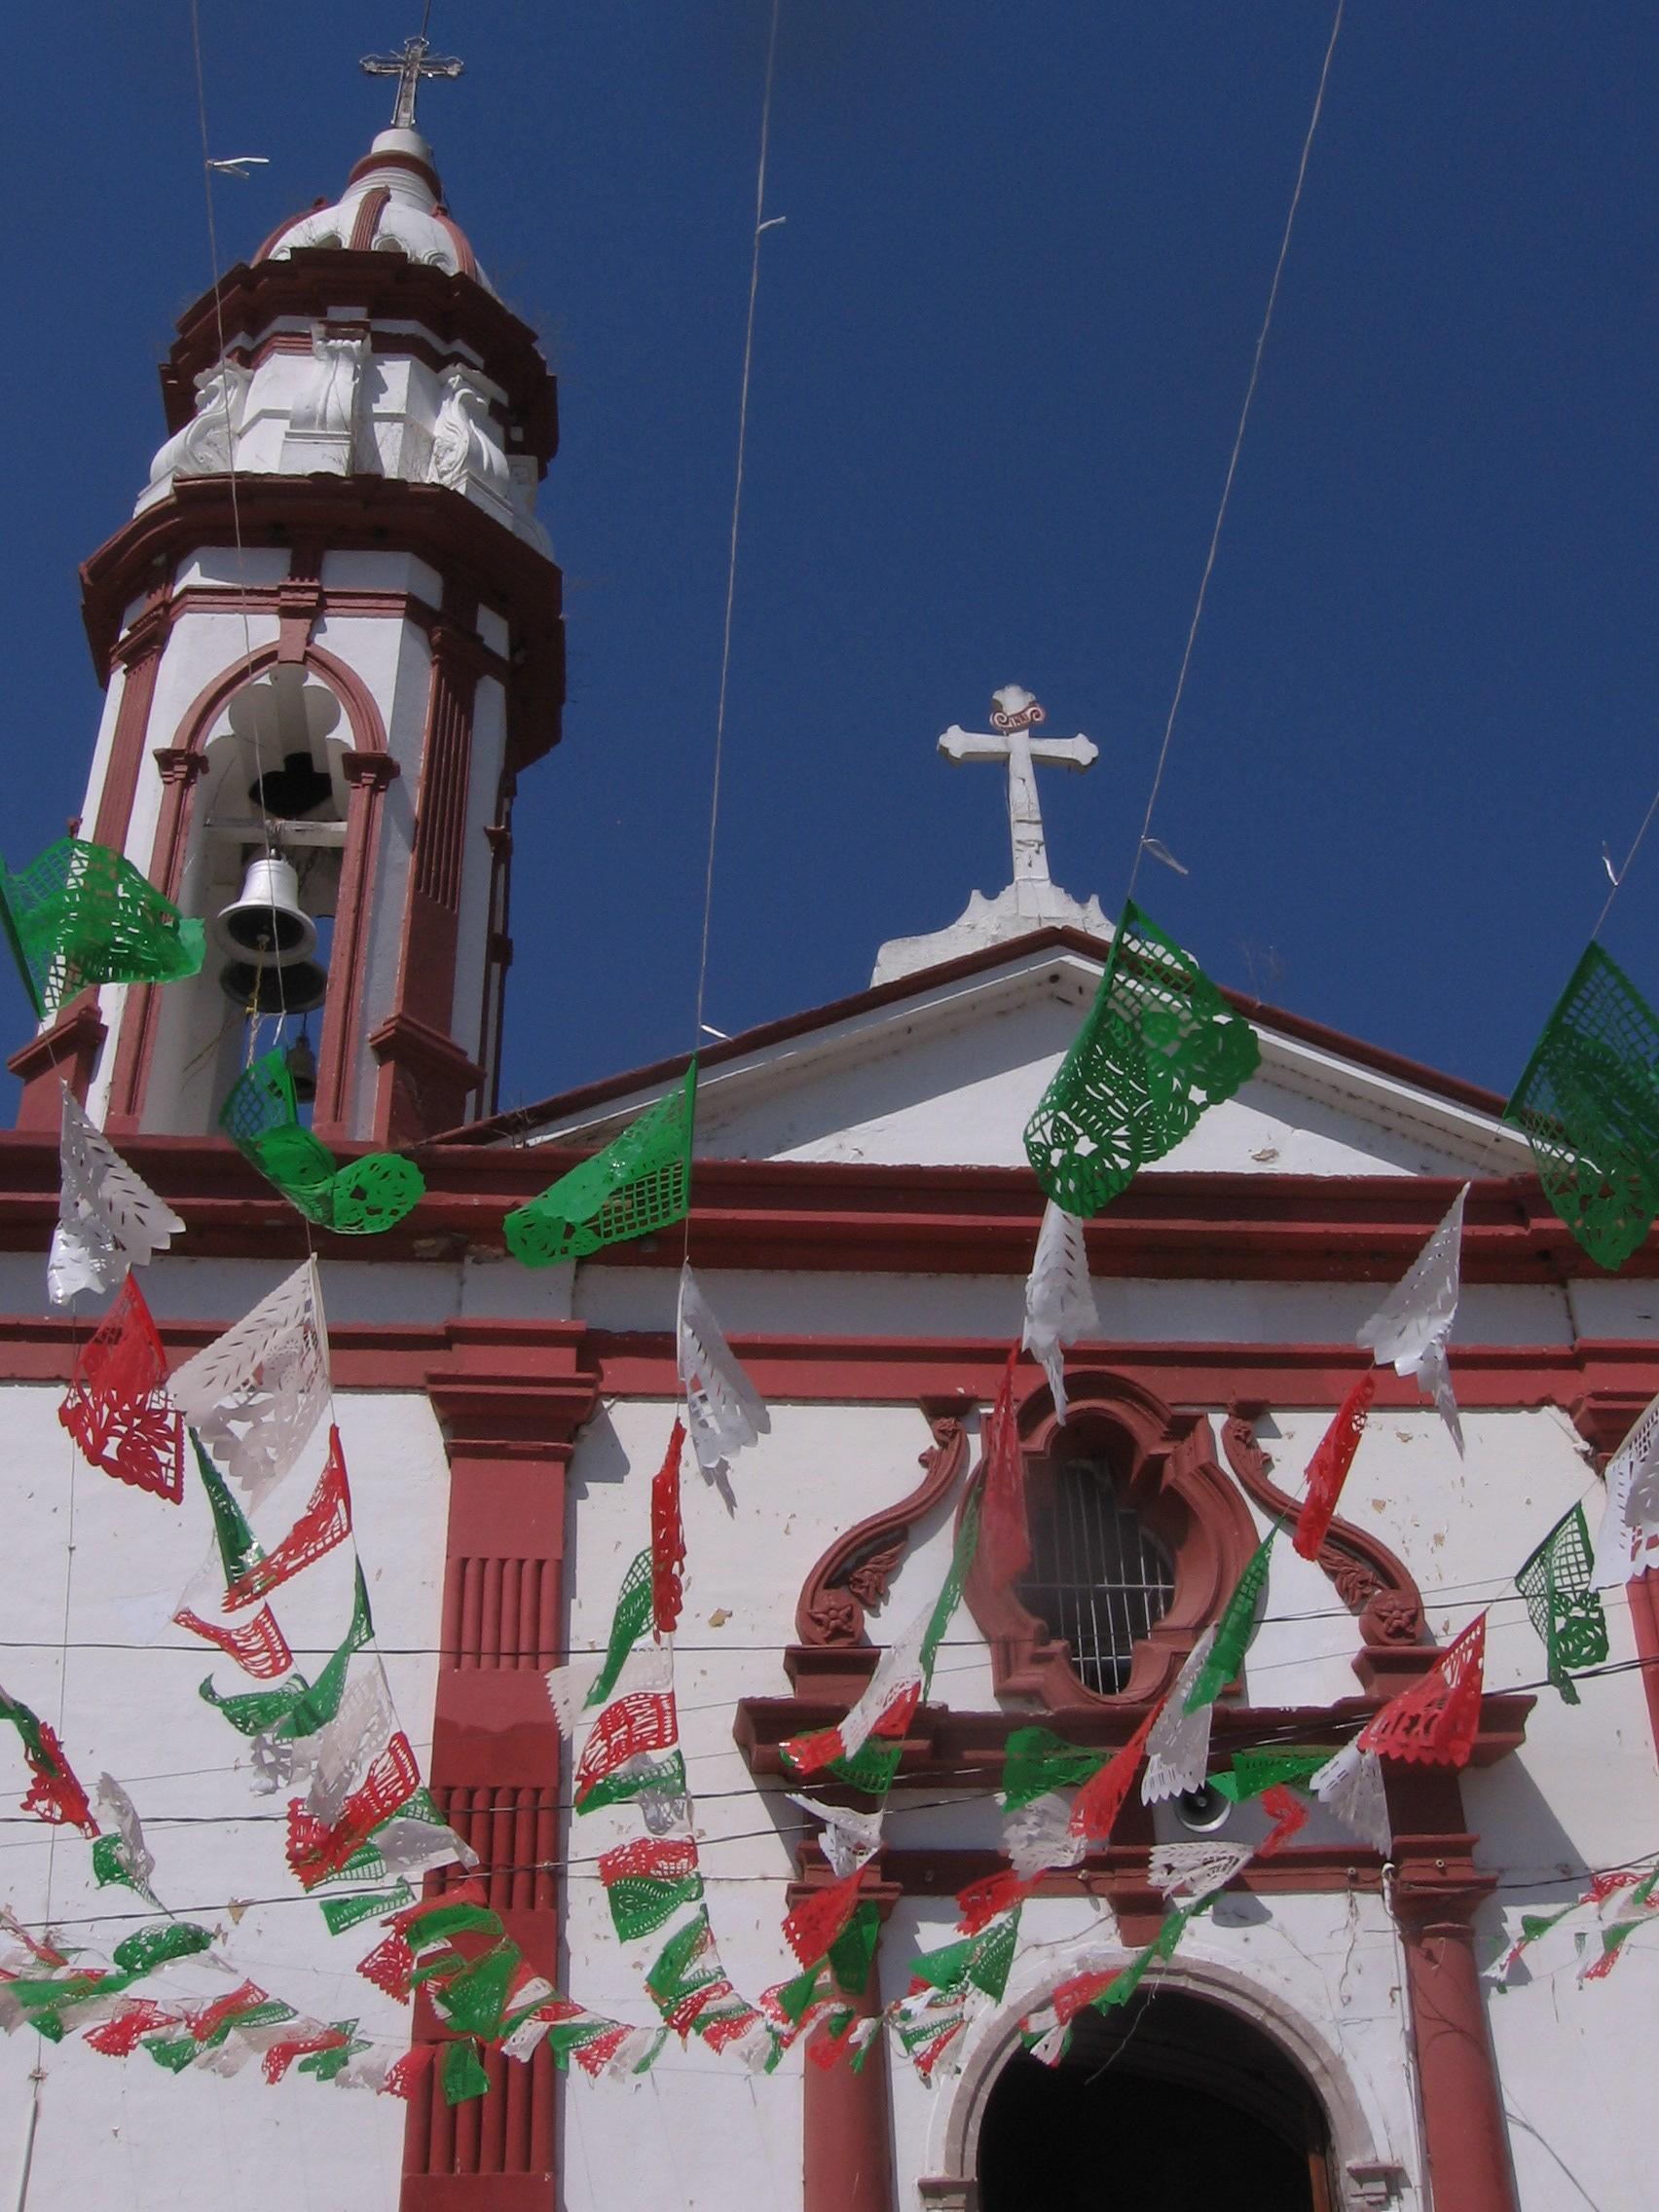 Filesan Gabriel Jalisco Santuario De La Virgen De Guadalupejpg